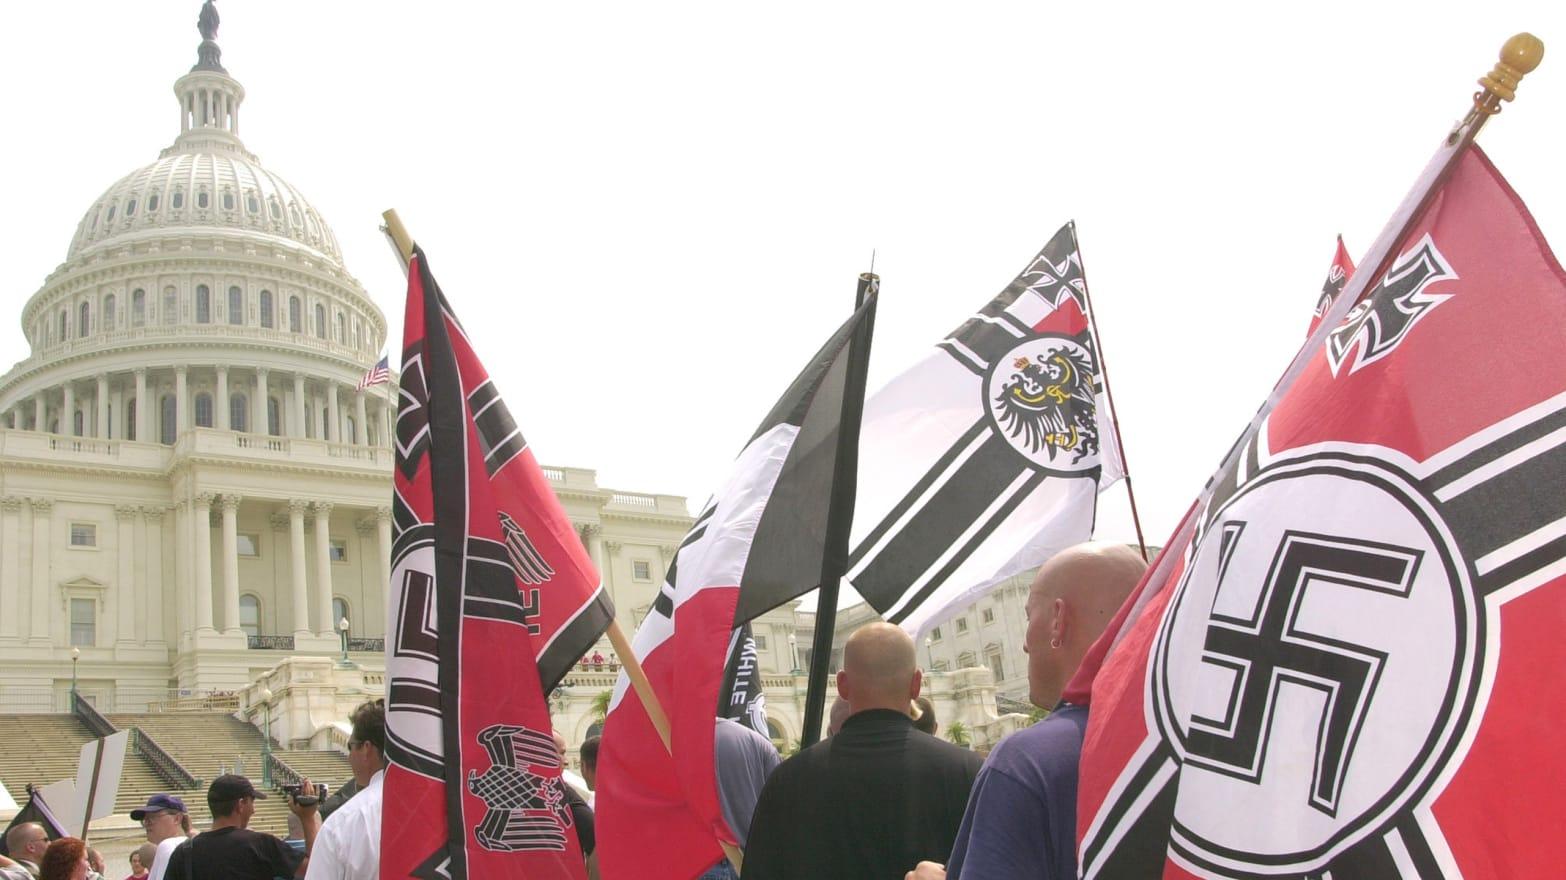 https://img.thedailybeast.com/image/upload/c_crop,d_placeholder_euli9k,h_1439,w_2560,x_0,y_0/dpr_1.5/c_limit,w_1044/fl_lossy,q_auto/v1492189305/articles/2014/01/30/should-neo-nazis-be-allowed-free-speech/140130-rosenbaum-neo-nazi-tease_tjcng3